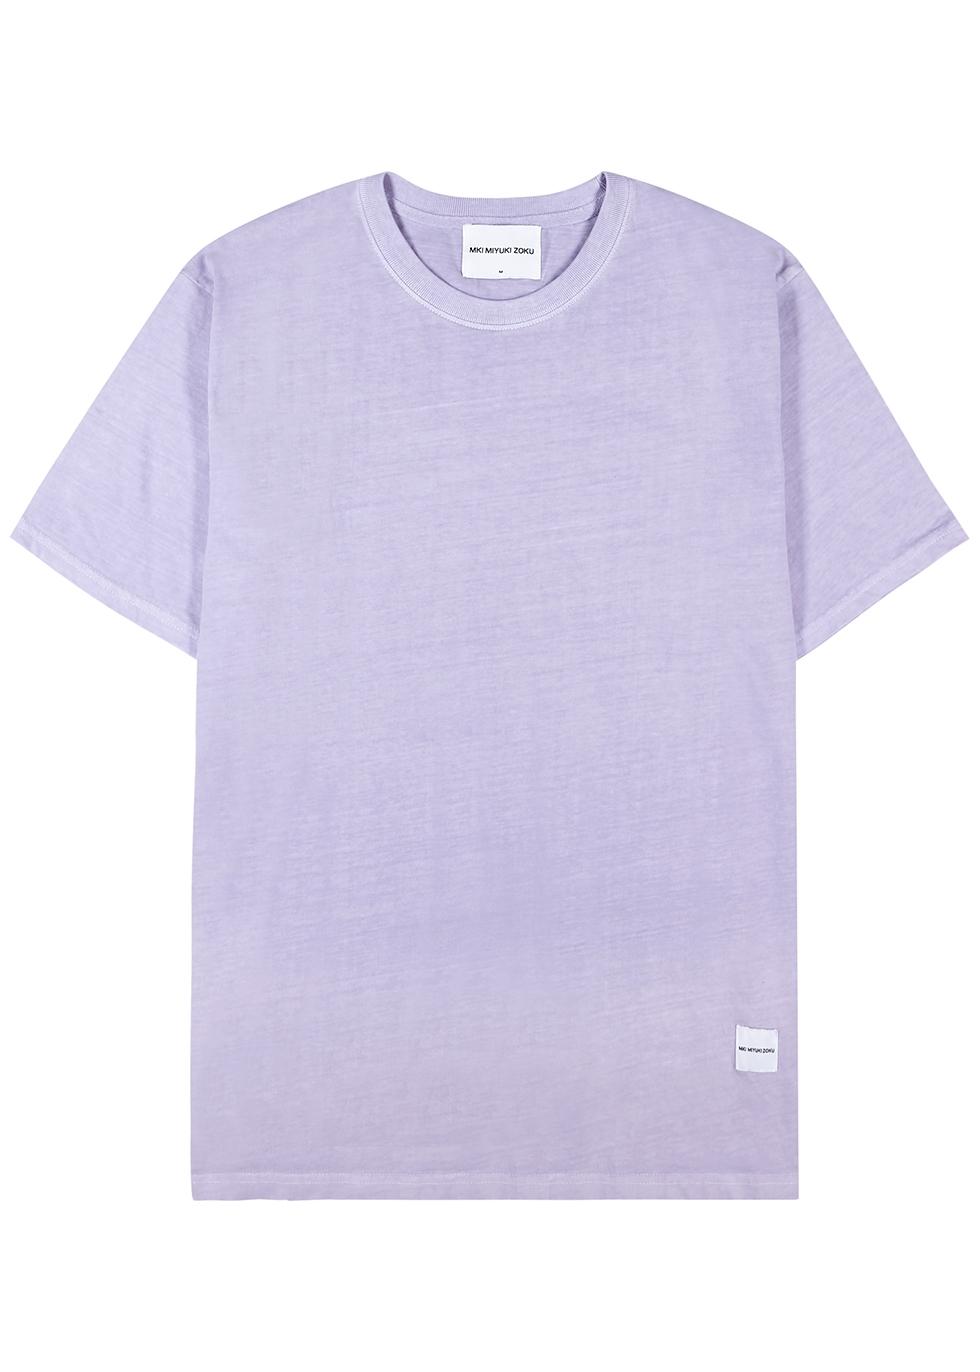 Light grey cotton T-shirt